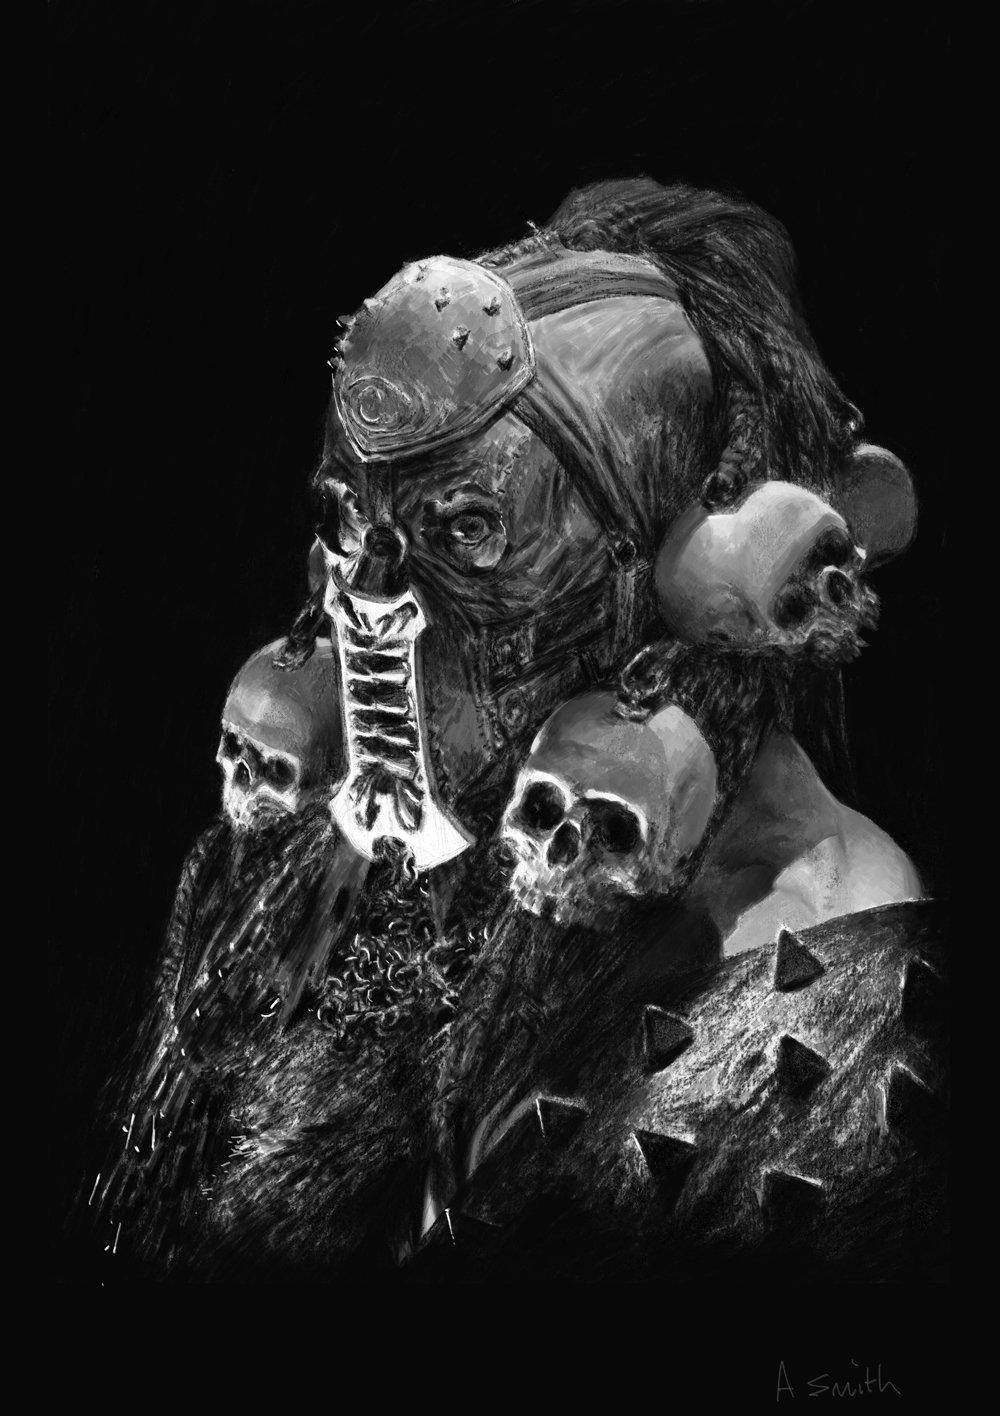 adrian-smith-illustration-oldskull-10